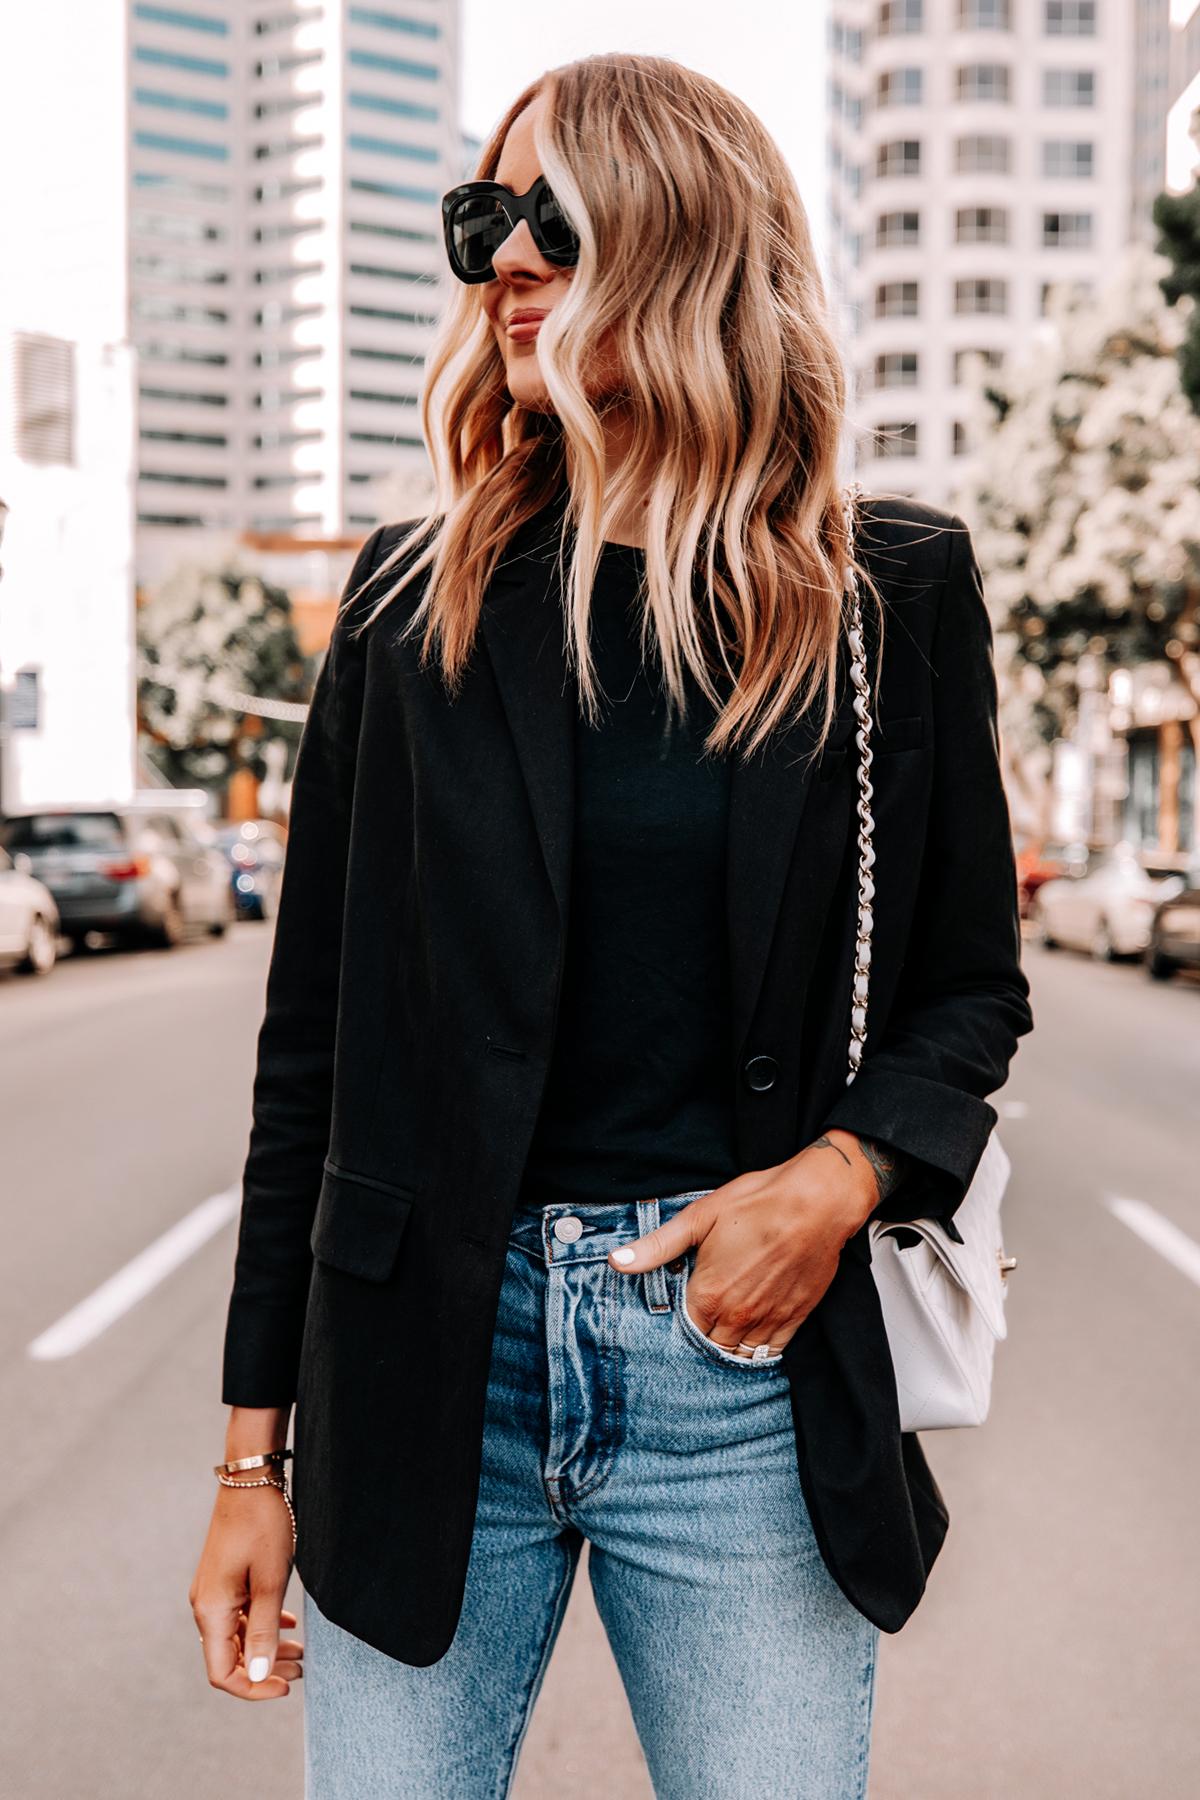 Fashion Jackson Wearing Everlane Black Blazer Black Tshirt Levis Jeans Chanel White Medium Flap Bag 1